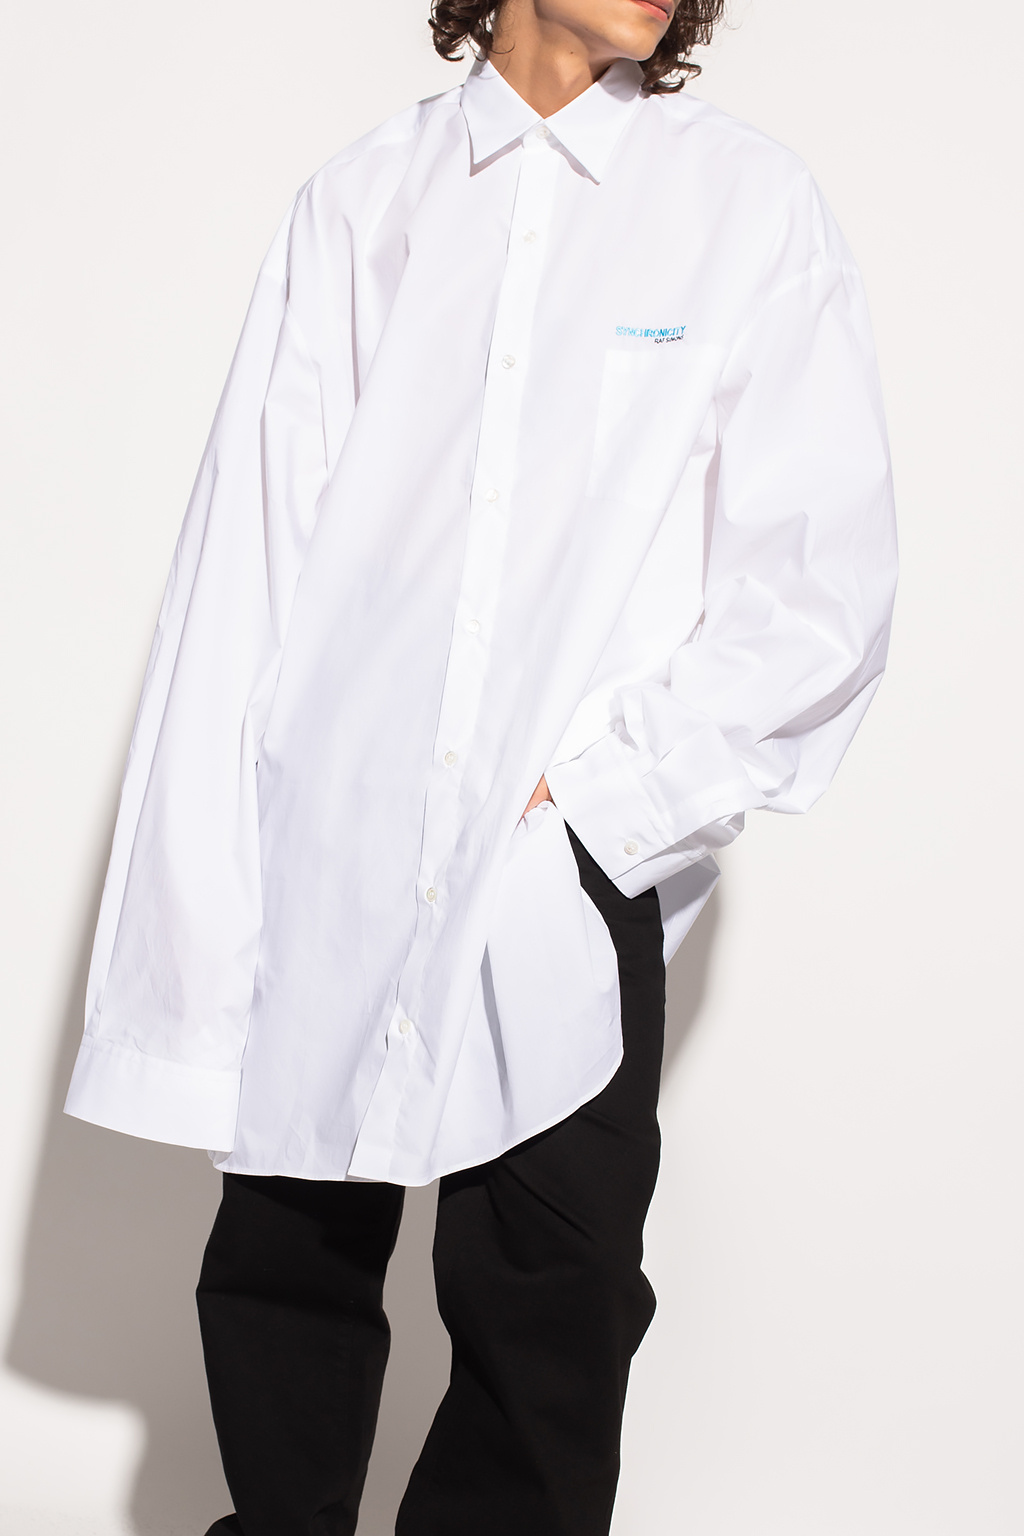 Raf Simons Oversize shirt